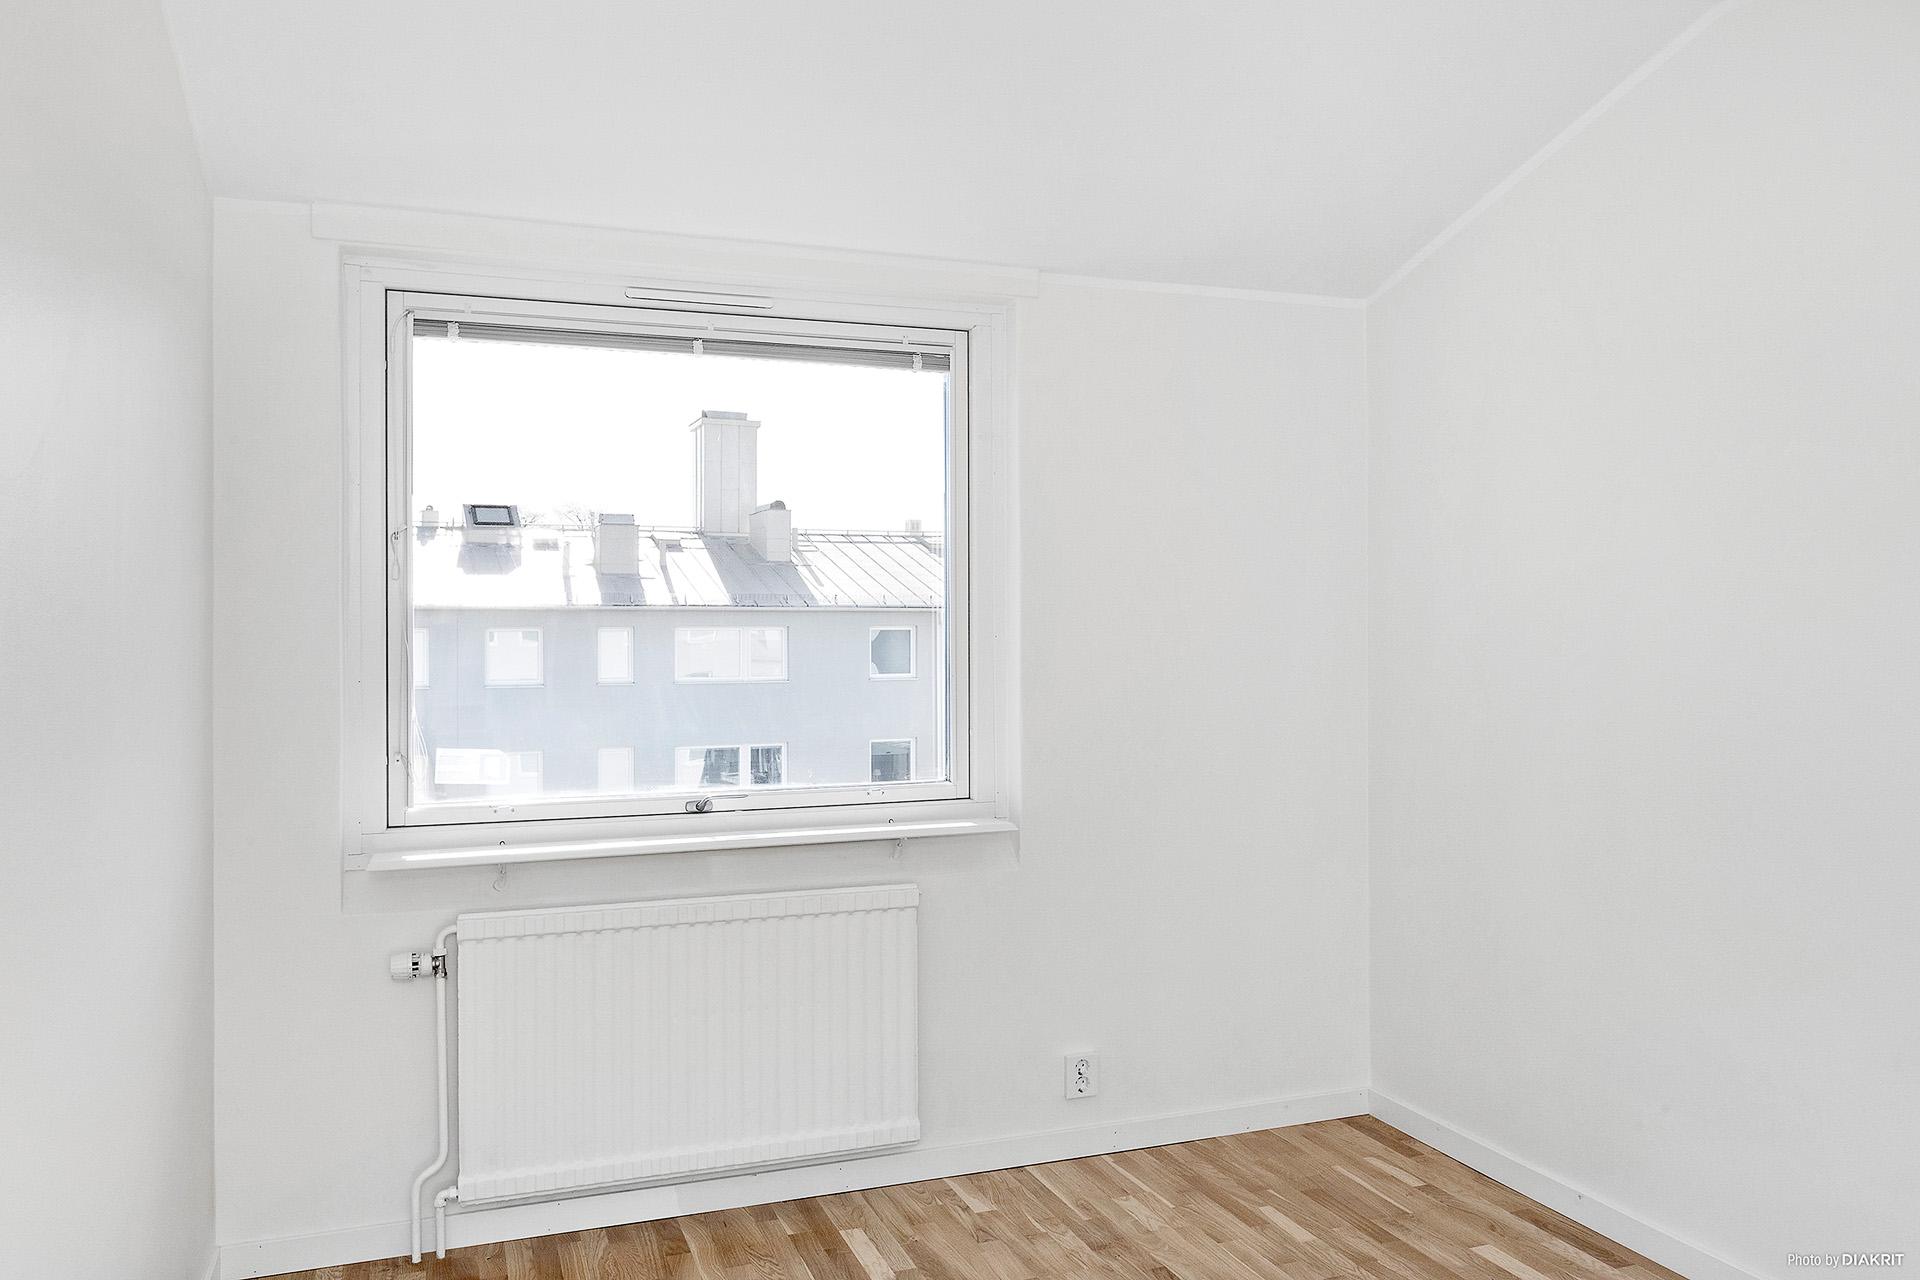 Sovrum 2 med fönster mot innergård